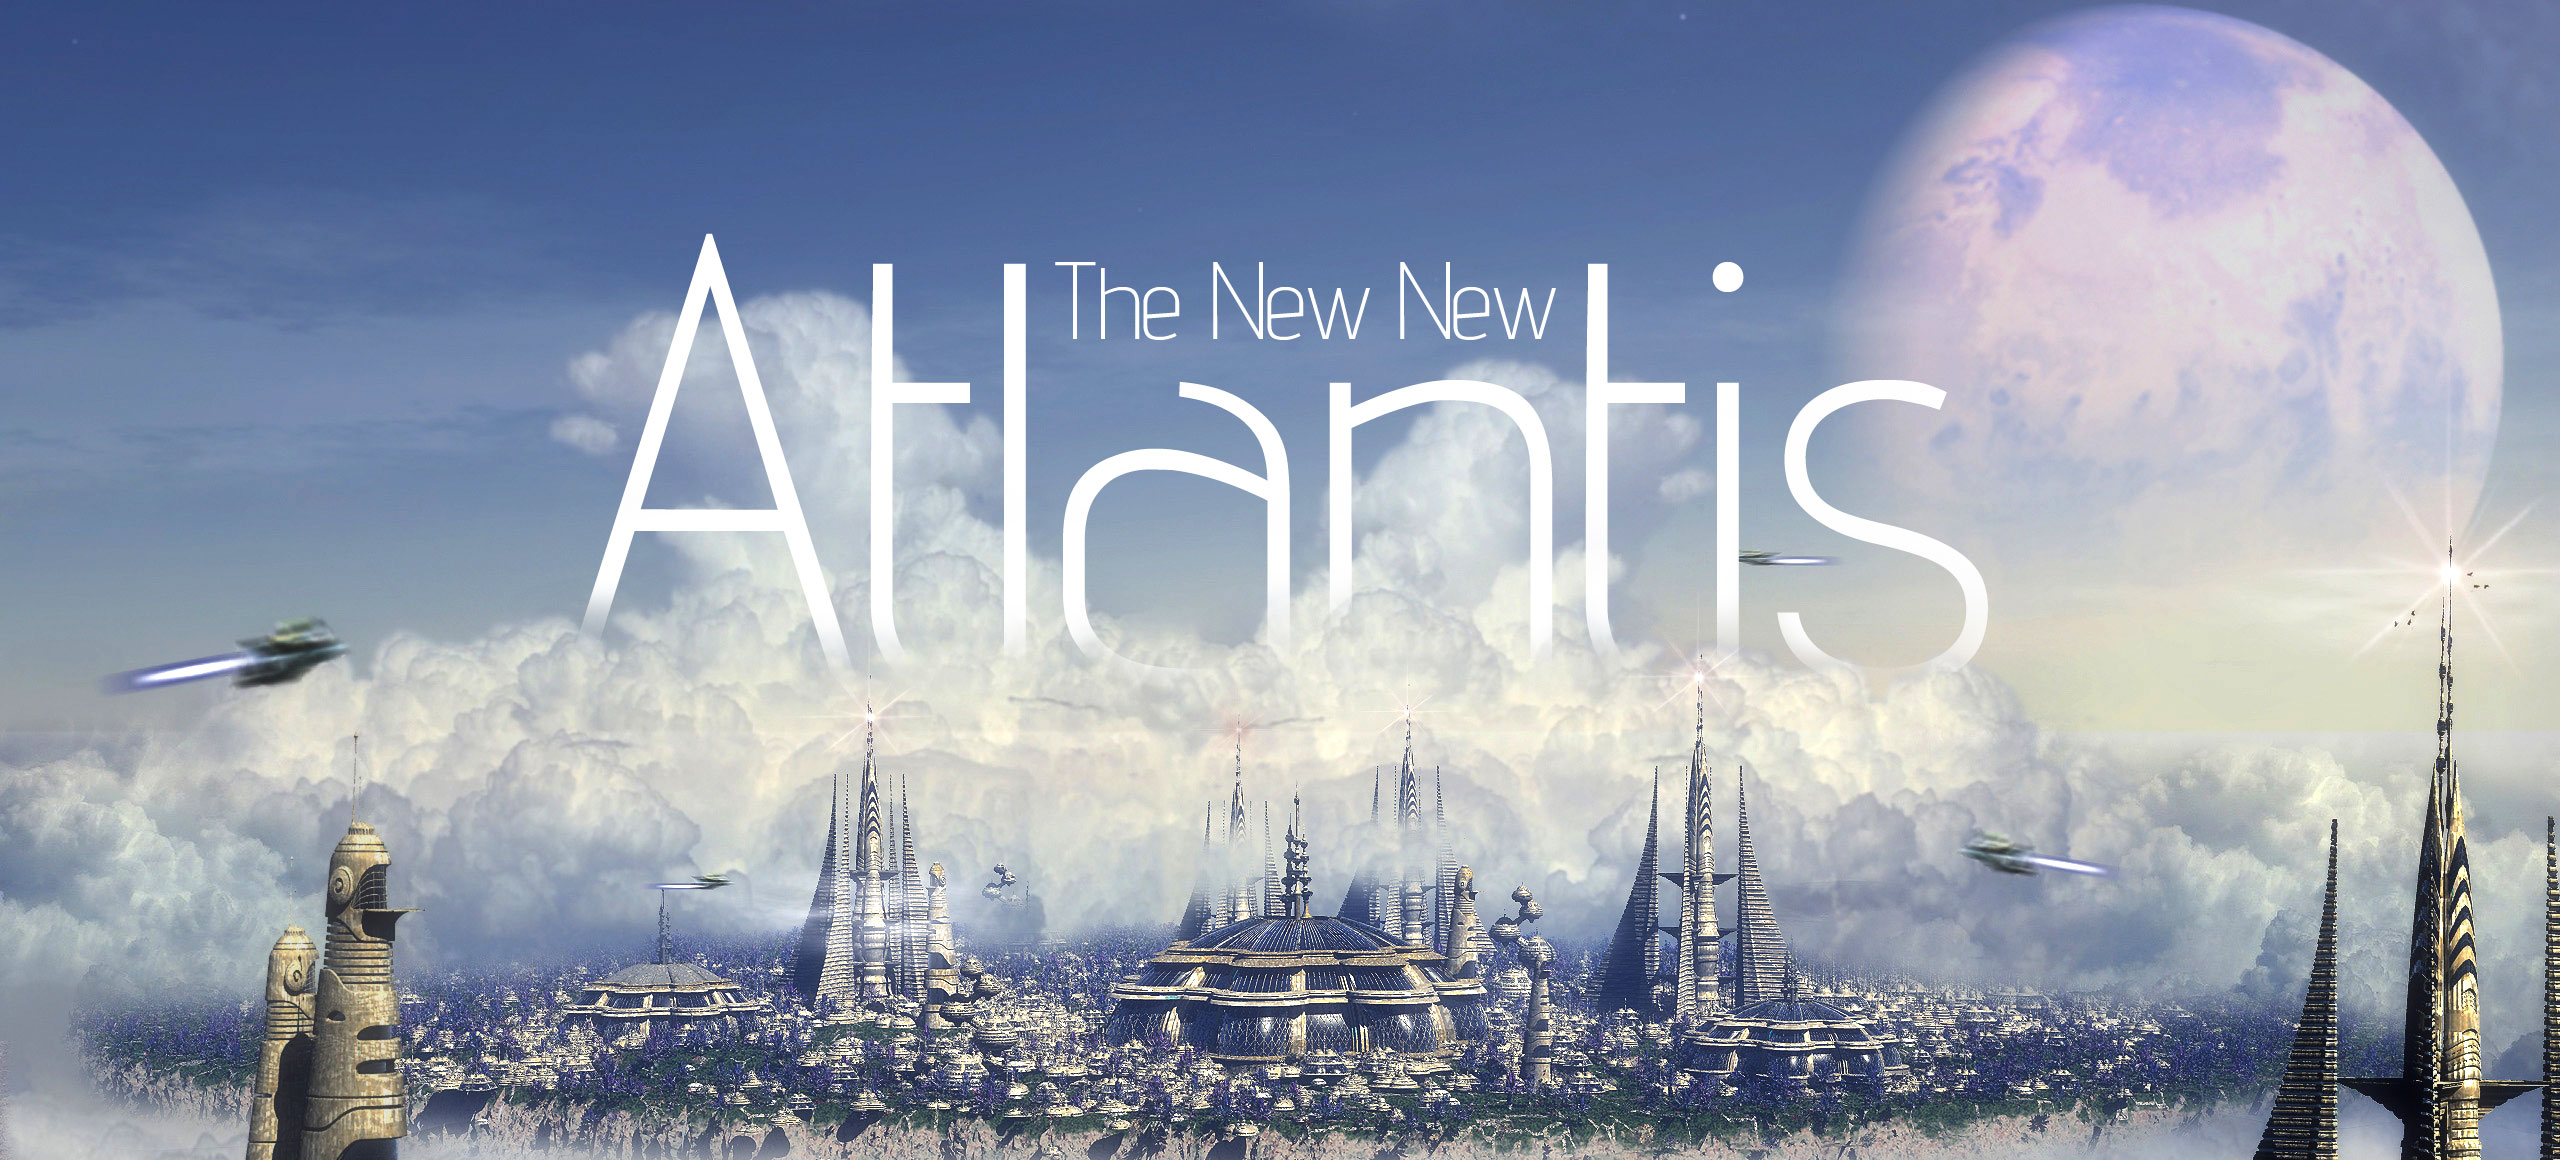 newnewatlantis2